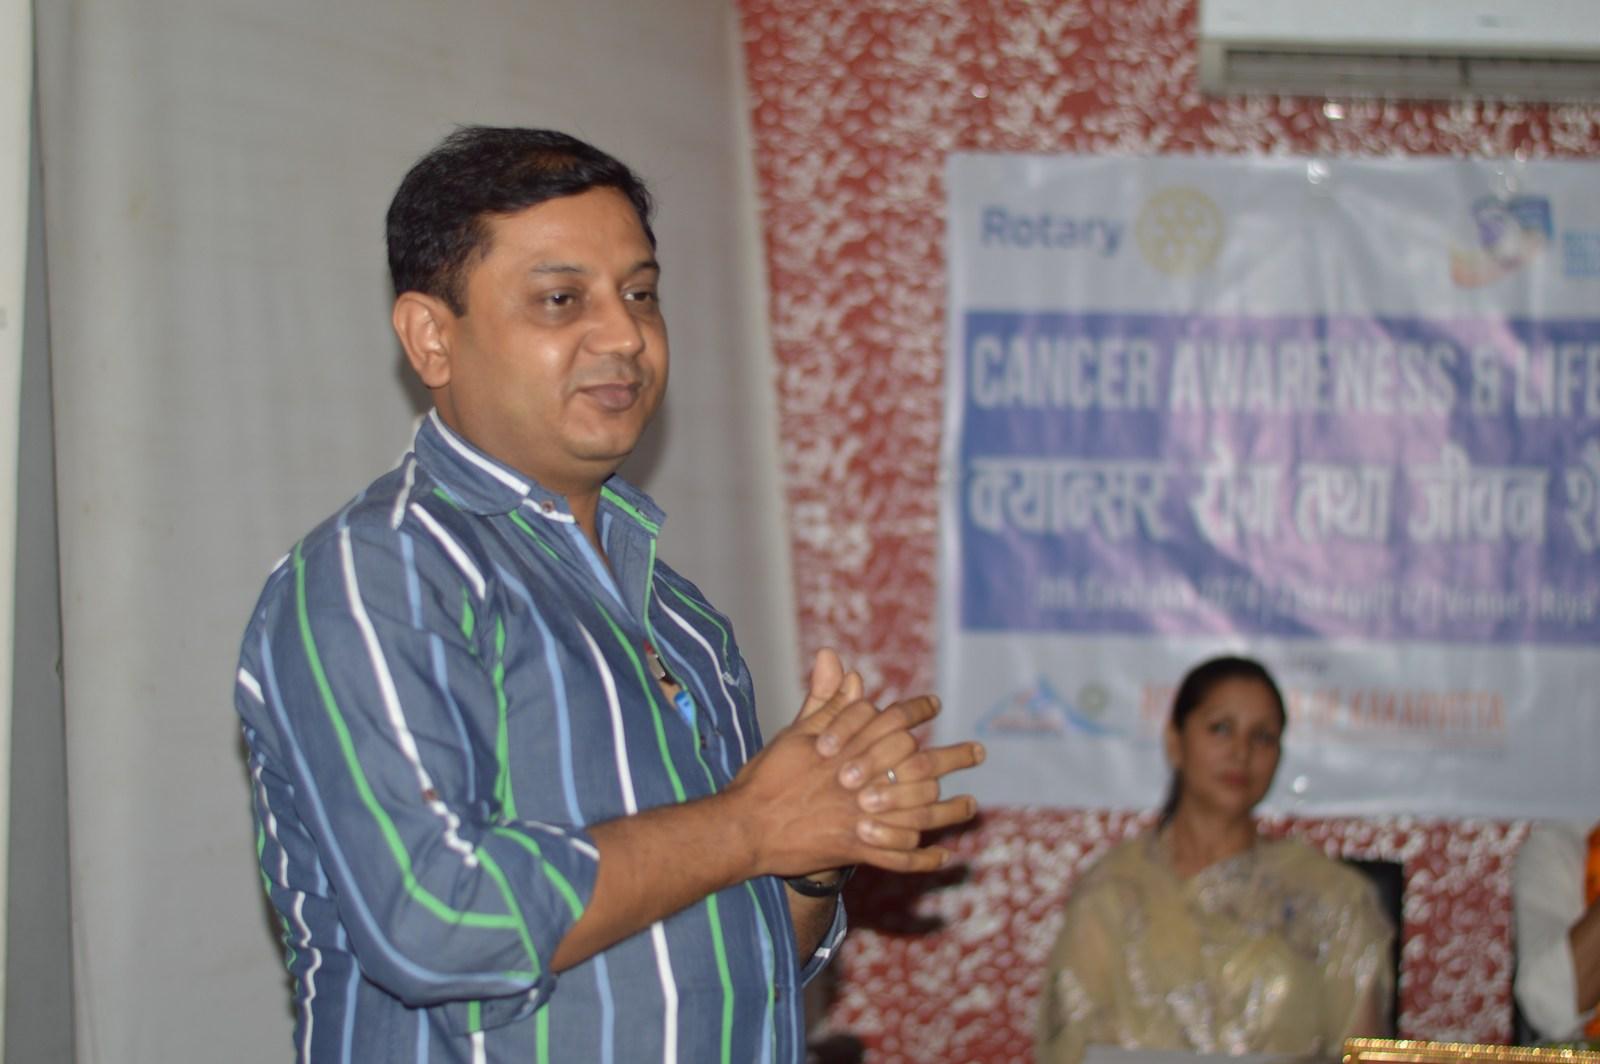 Cancer-Awareness-Life-Style-Management-Interaction-Program-2016-17-Rotary-Club-of-Kakarvitta-42